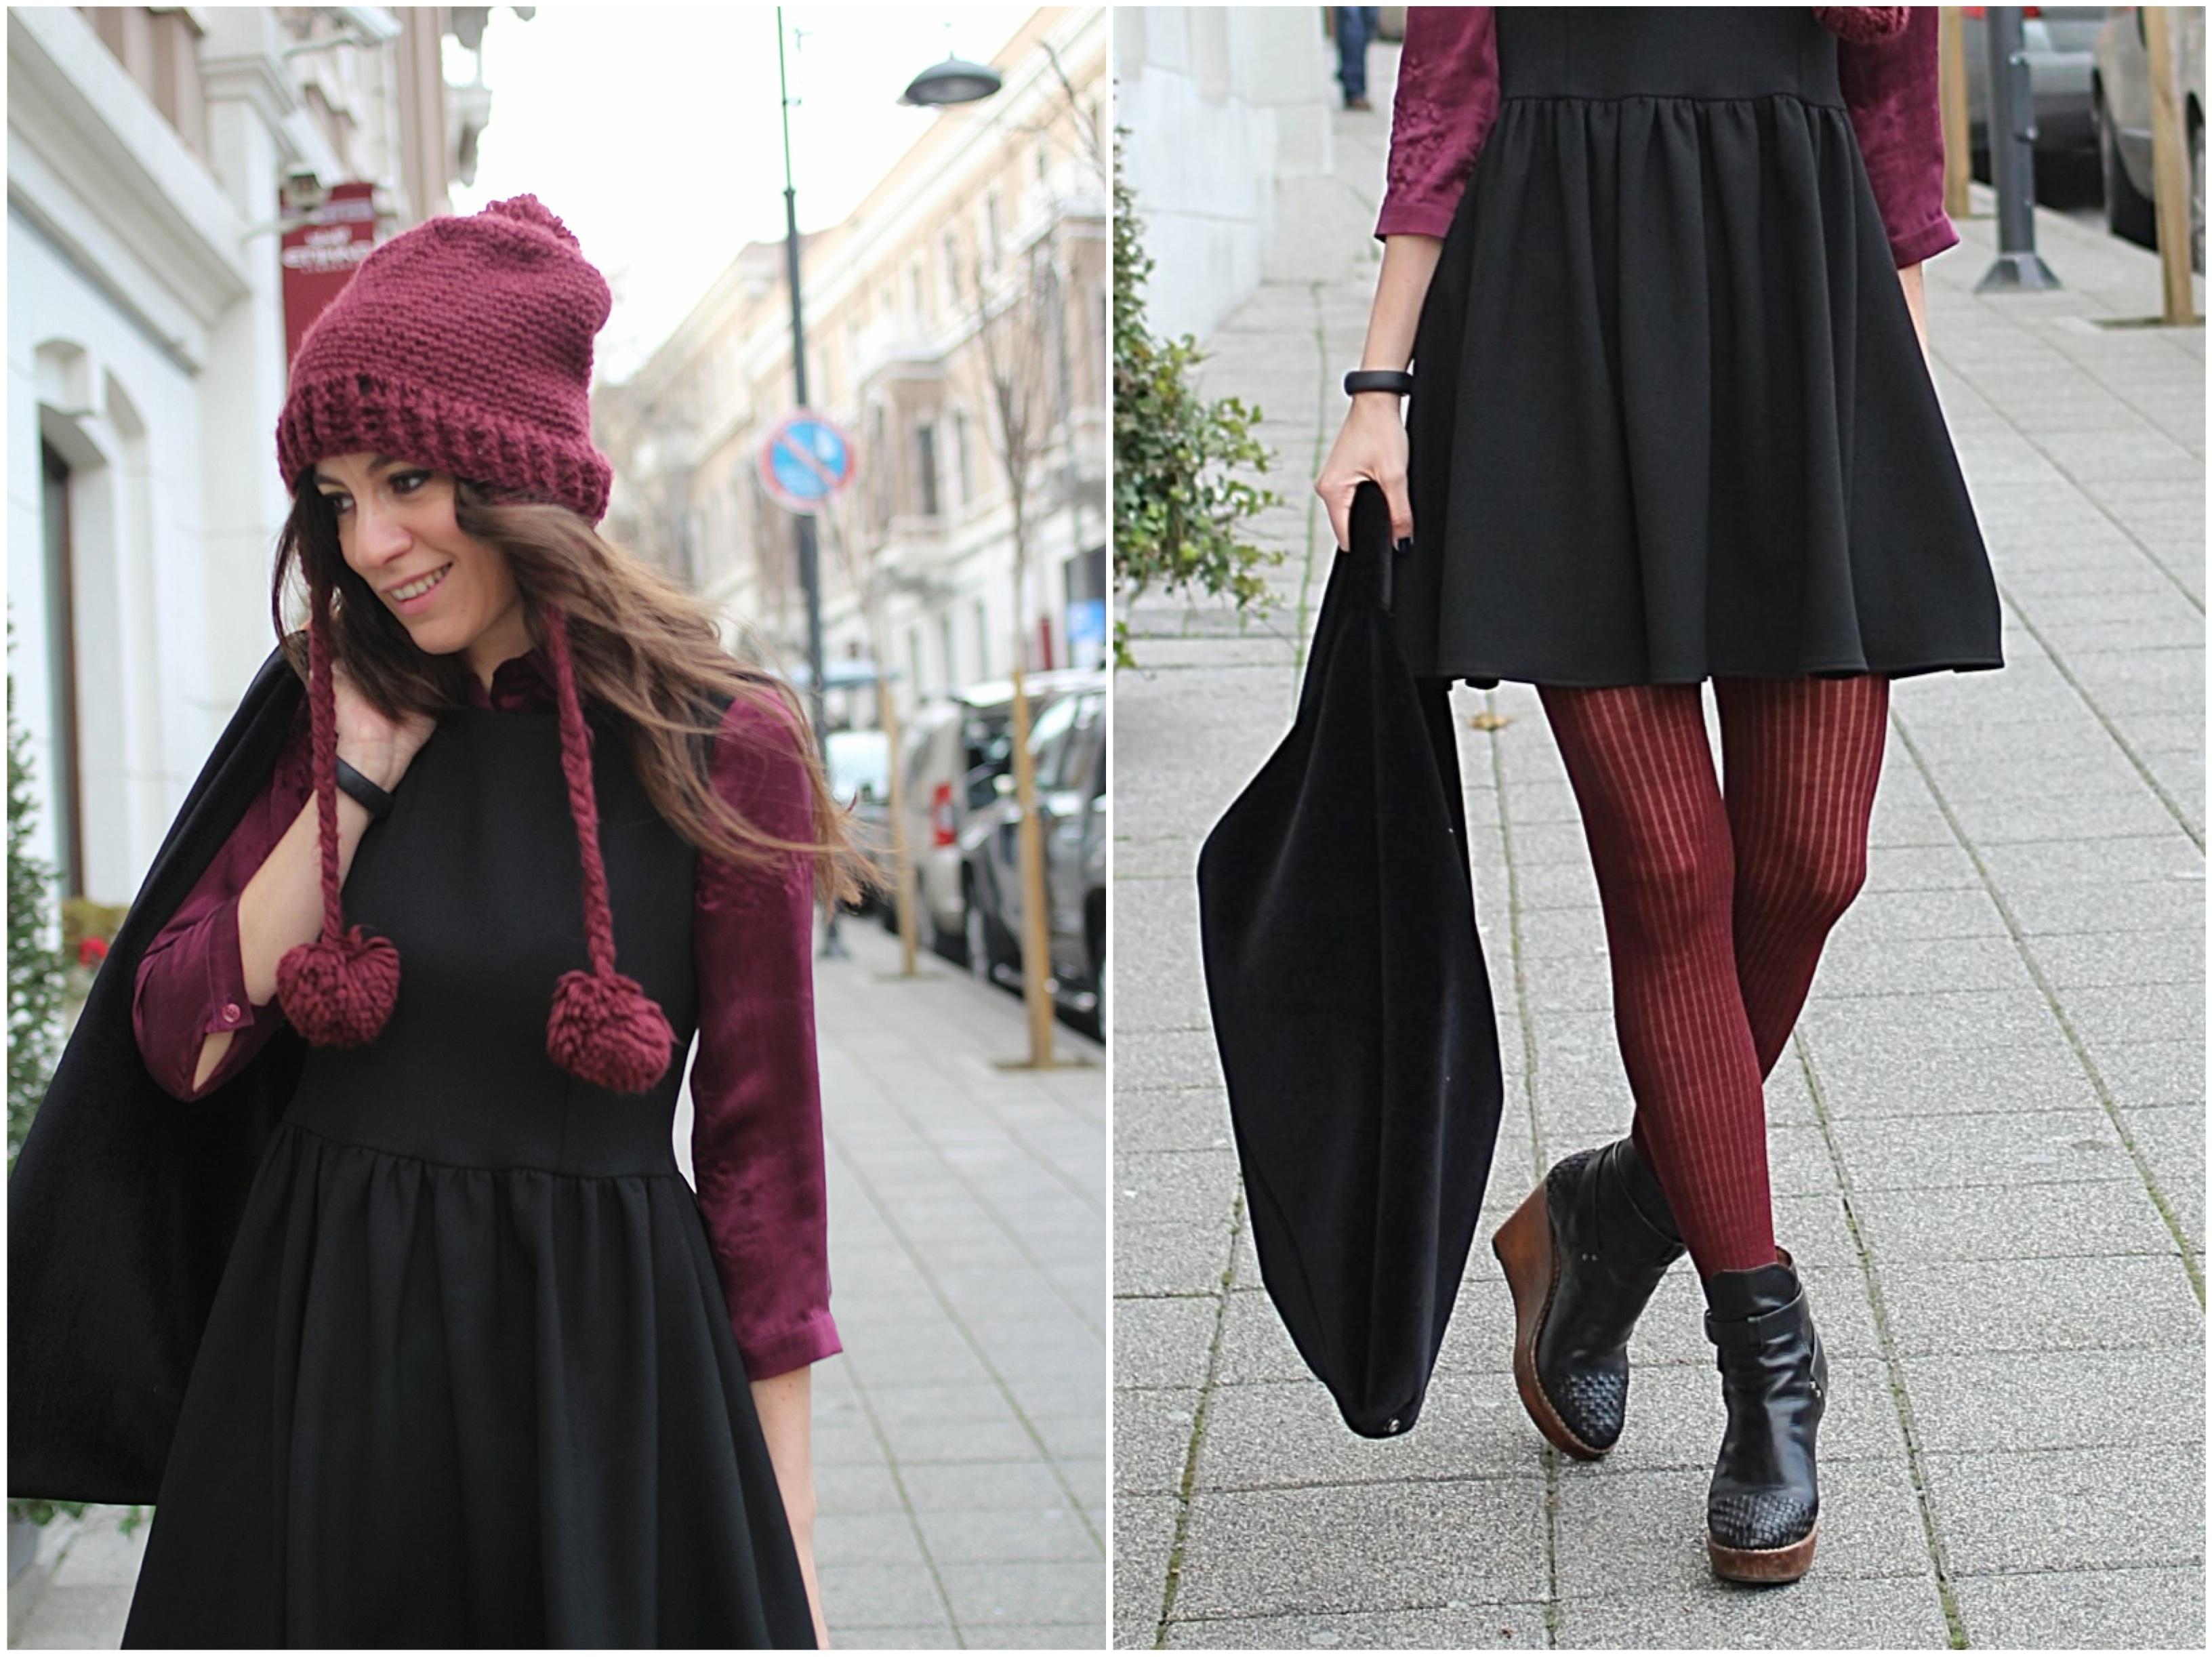 little black dress, burgundy, offnegiysem, streetstyle, outfit, blogger,